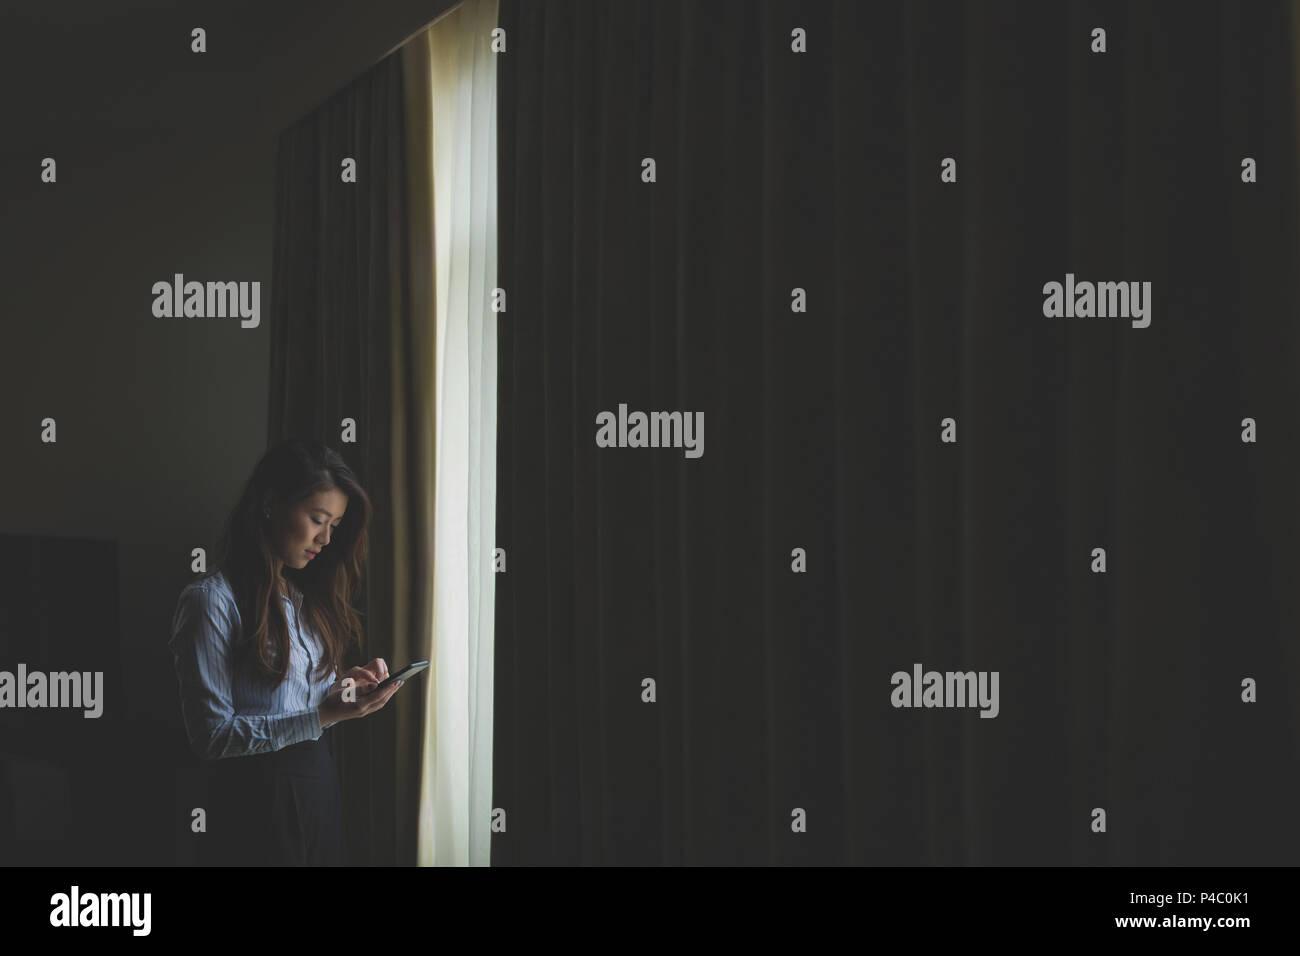 Businesswoman using mobile phone - Stock Image